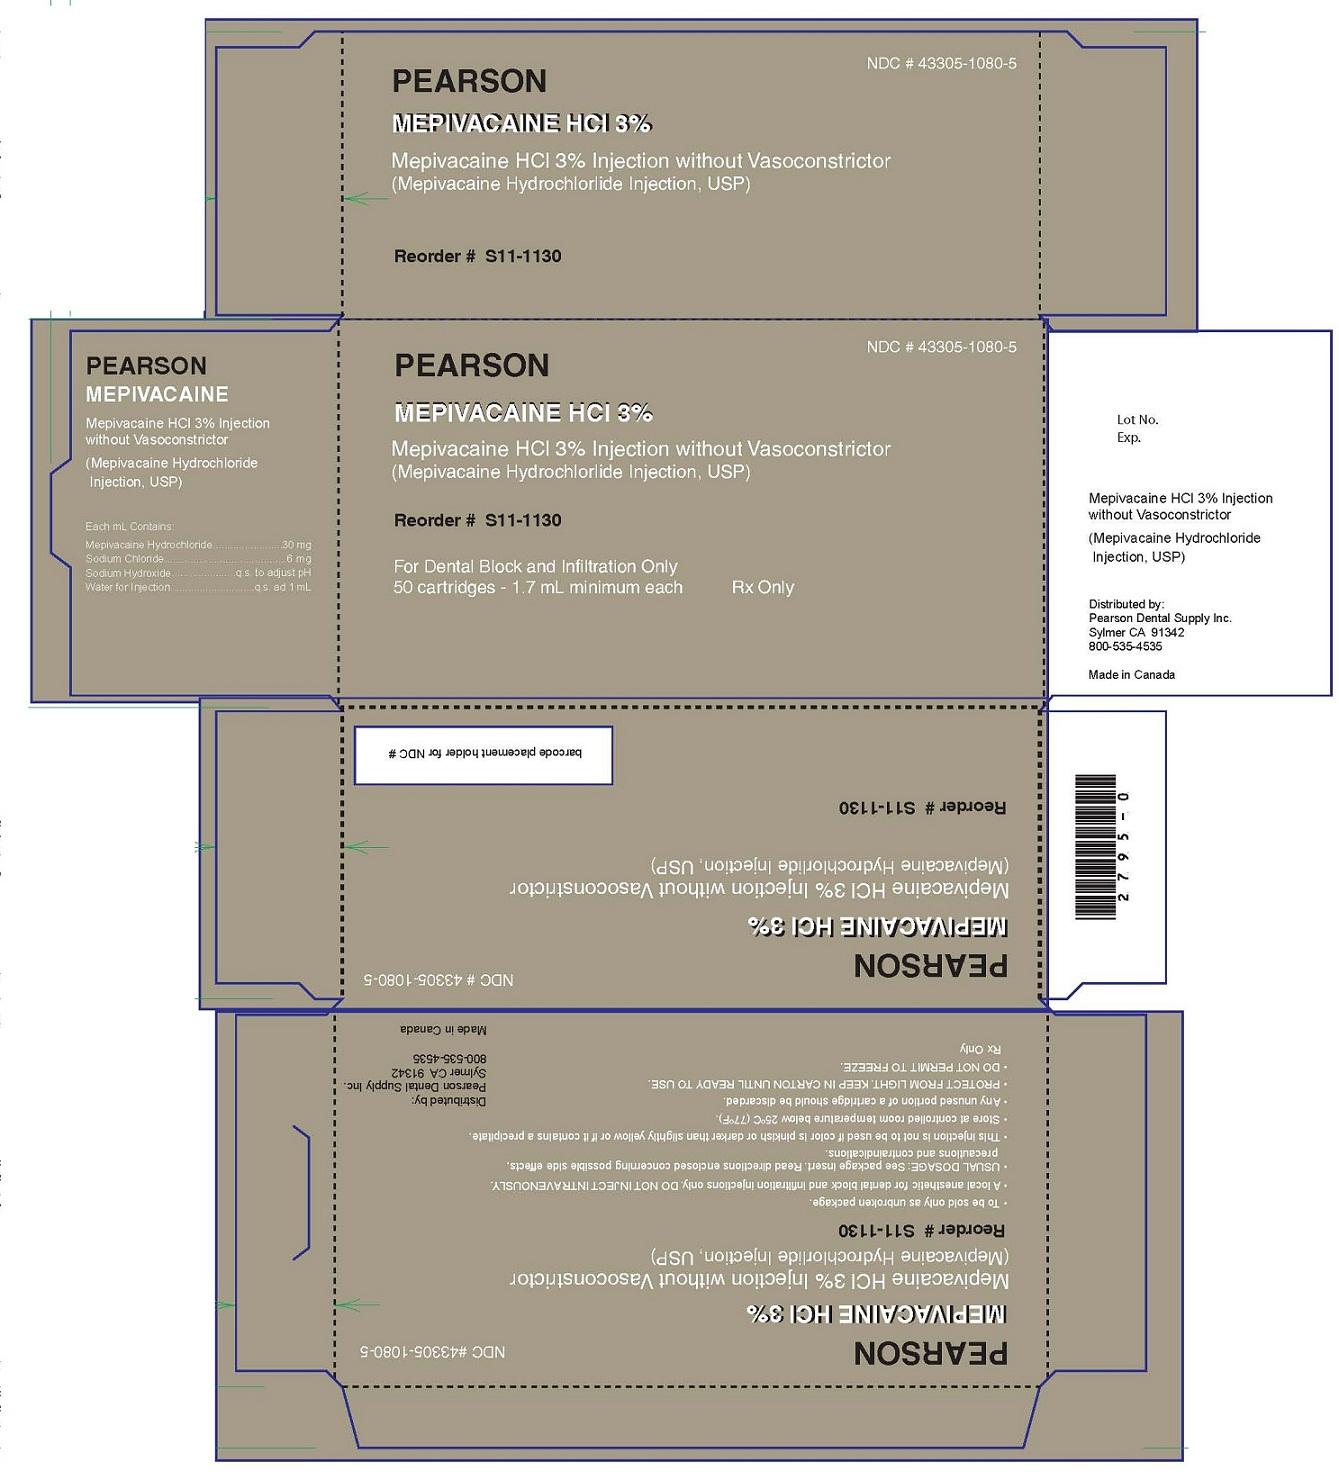 PRINCIPAL DISPLAY PANEL - 1.7 mL Cartridge Carton